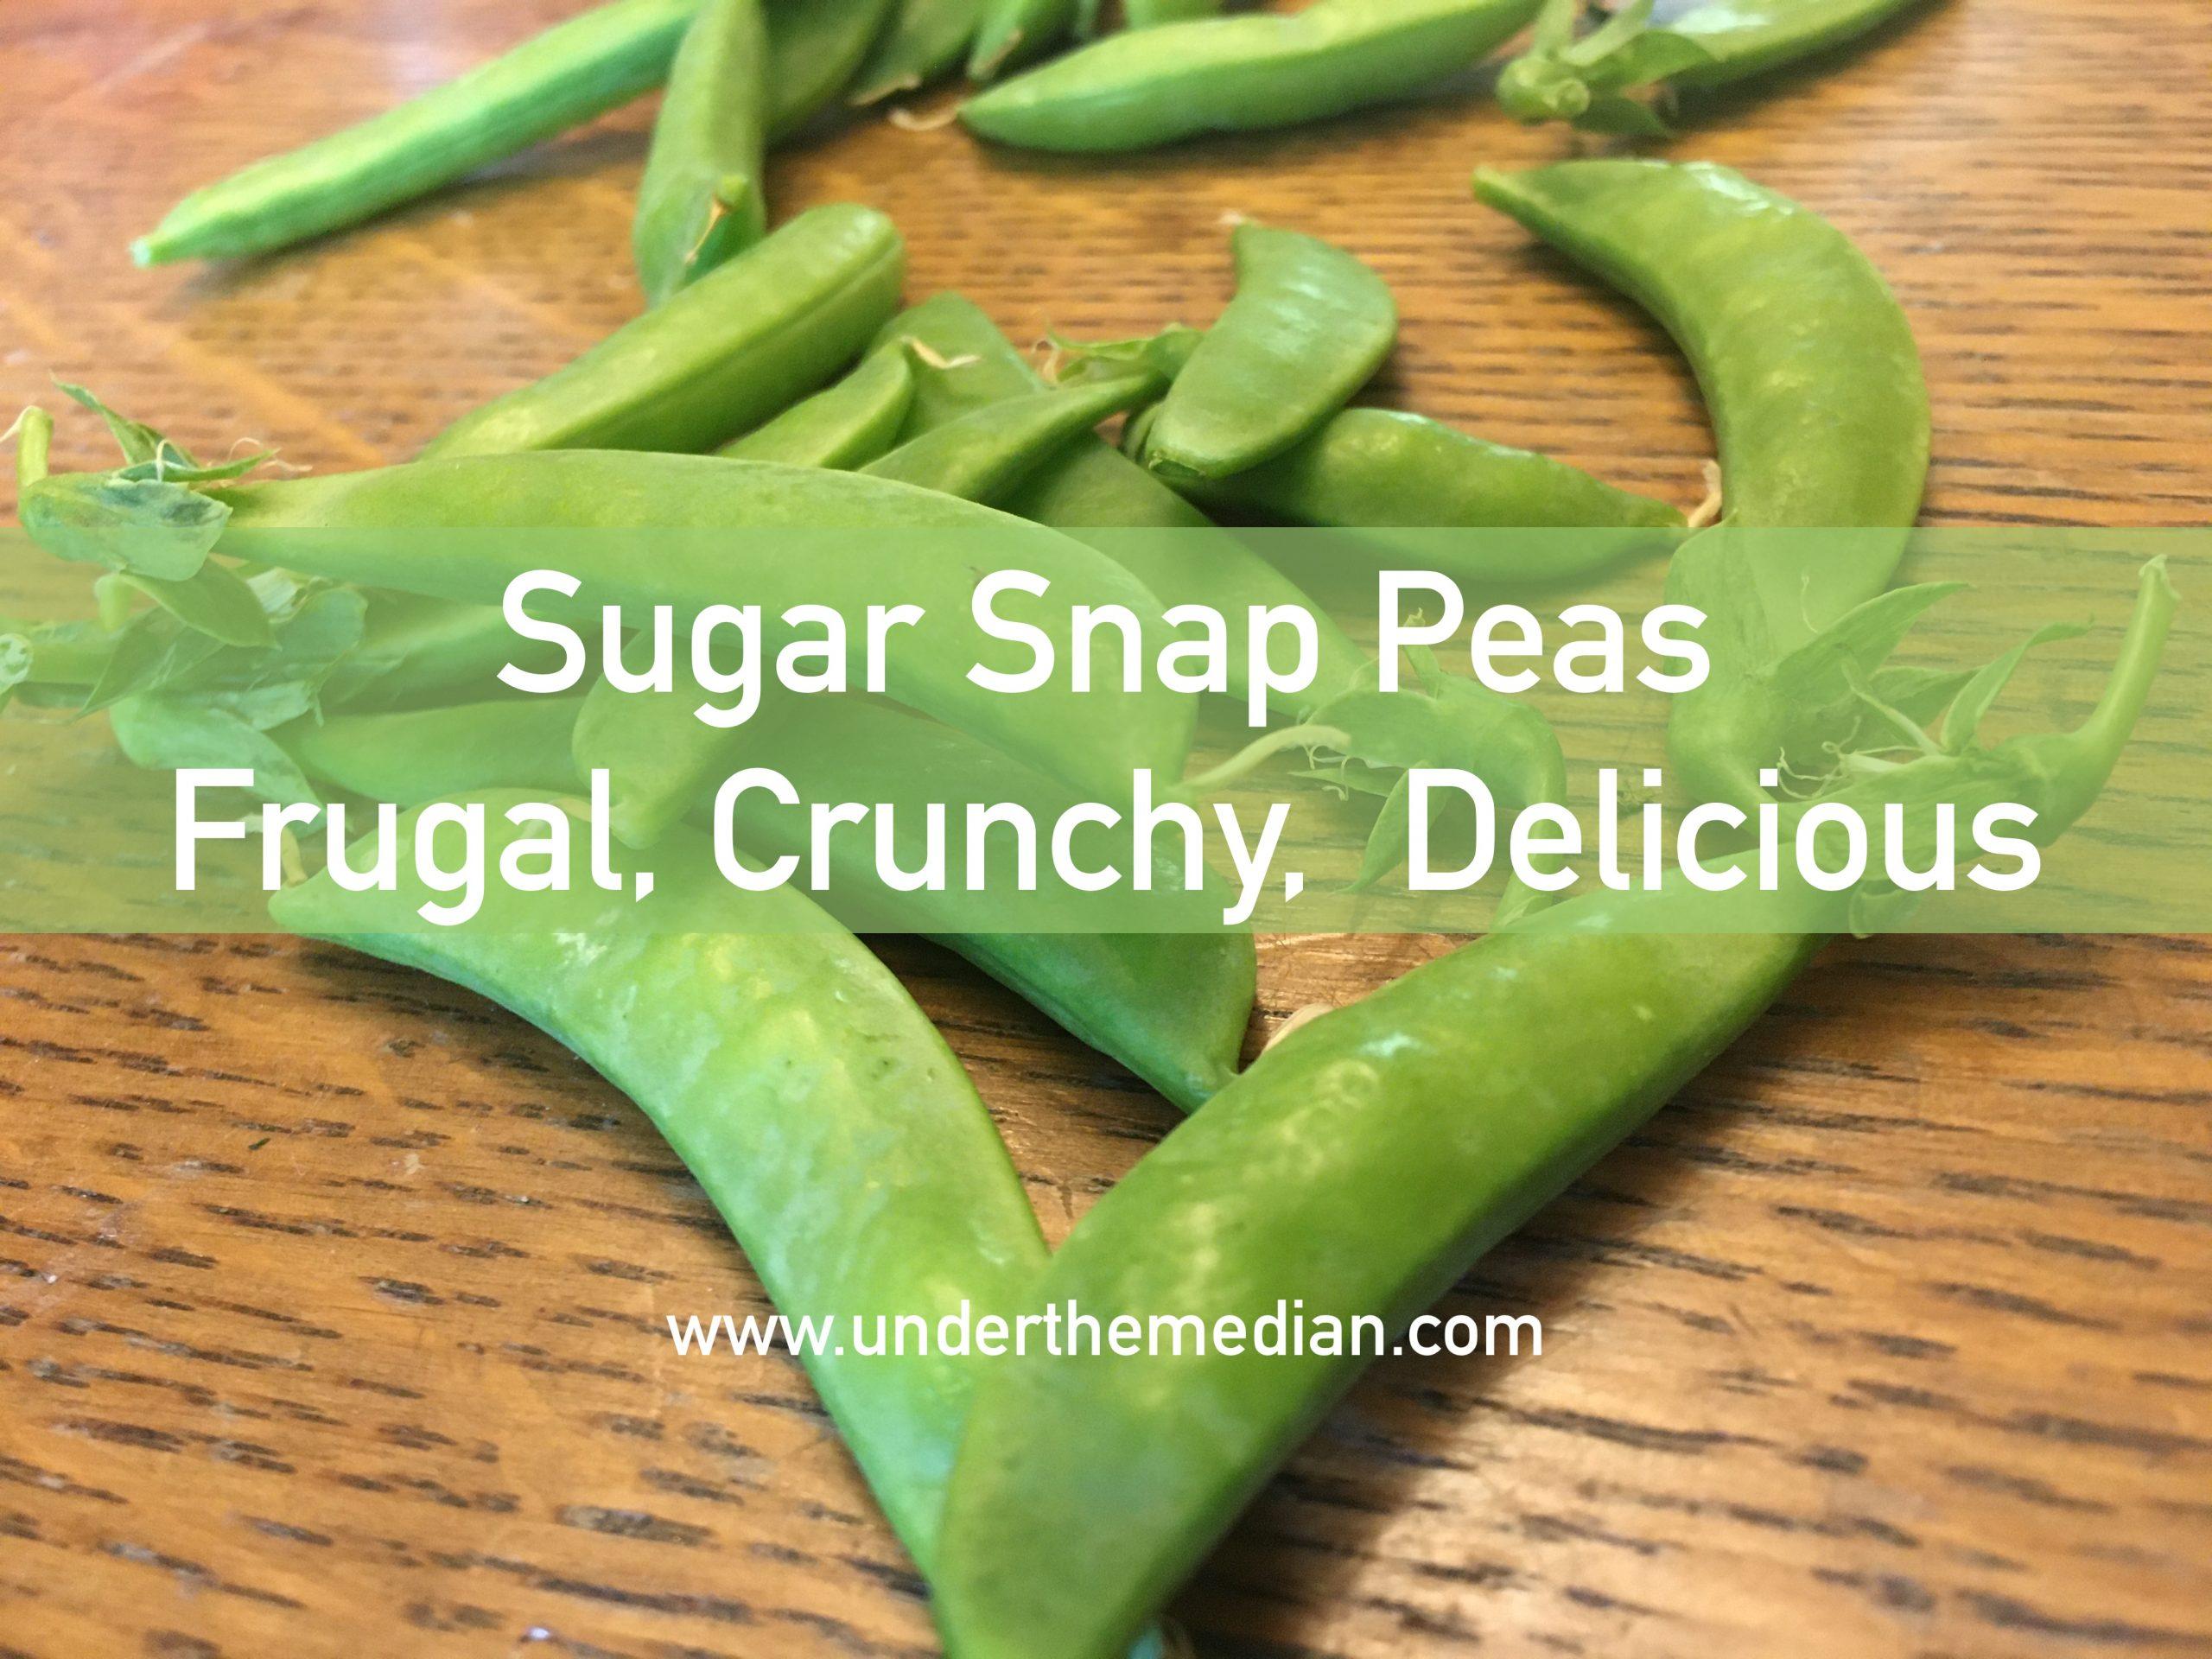 3 Reasons Sugar Snap Peas Are A Crispy, Frugal Treat